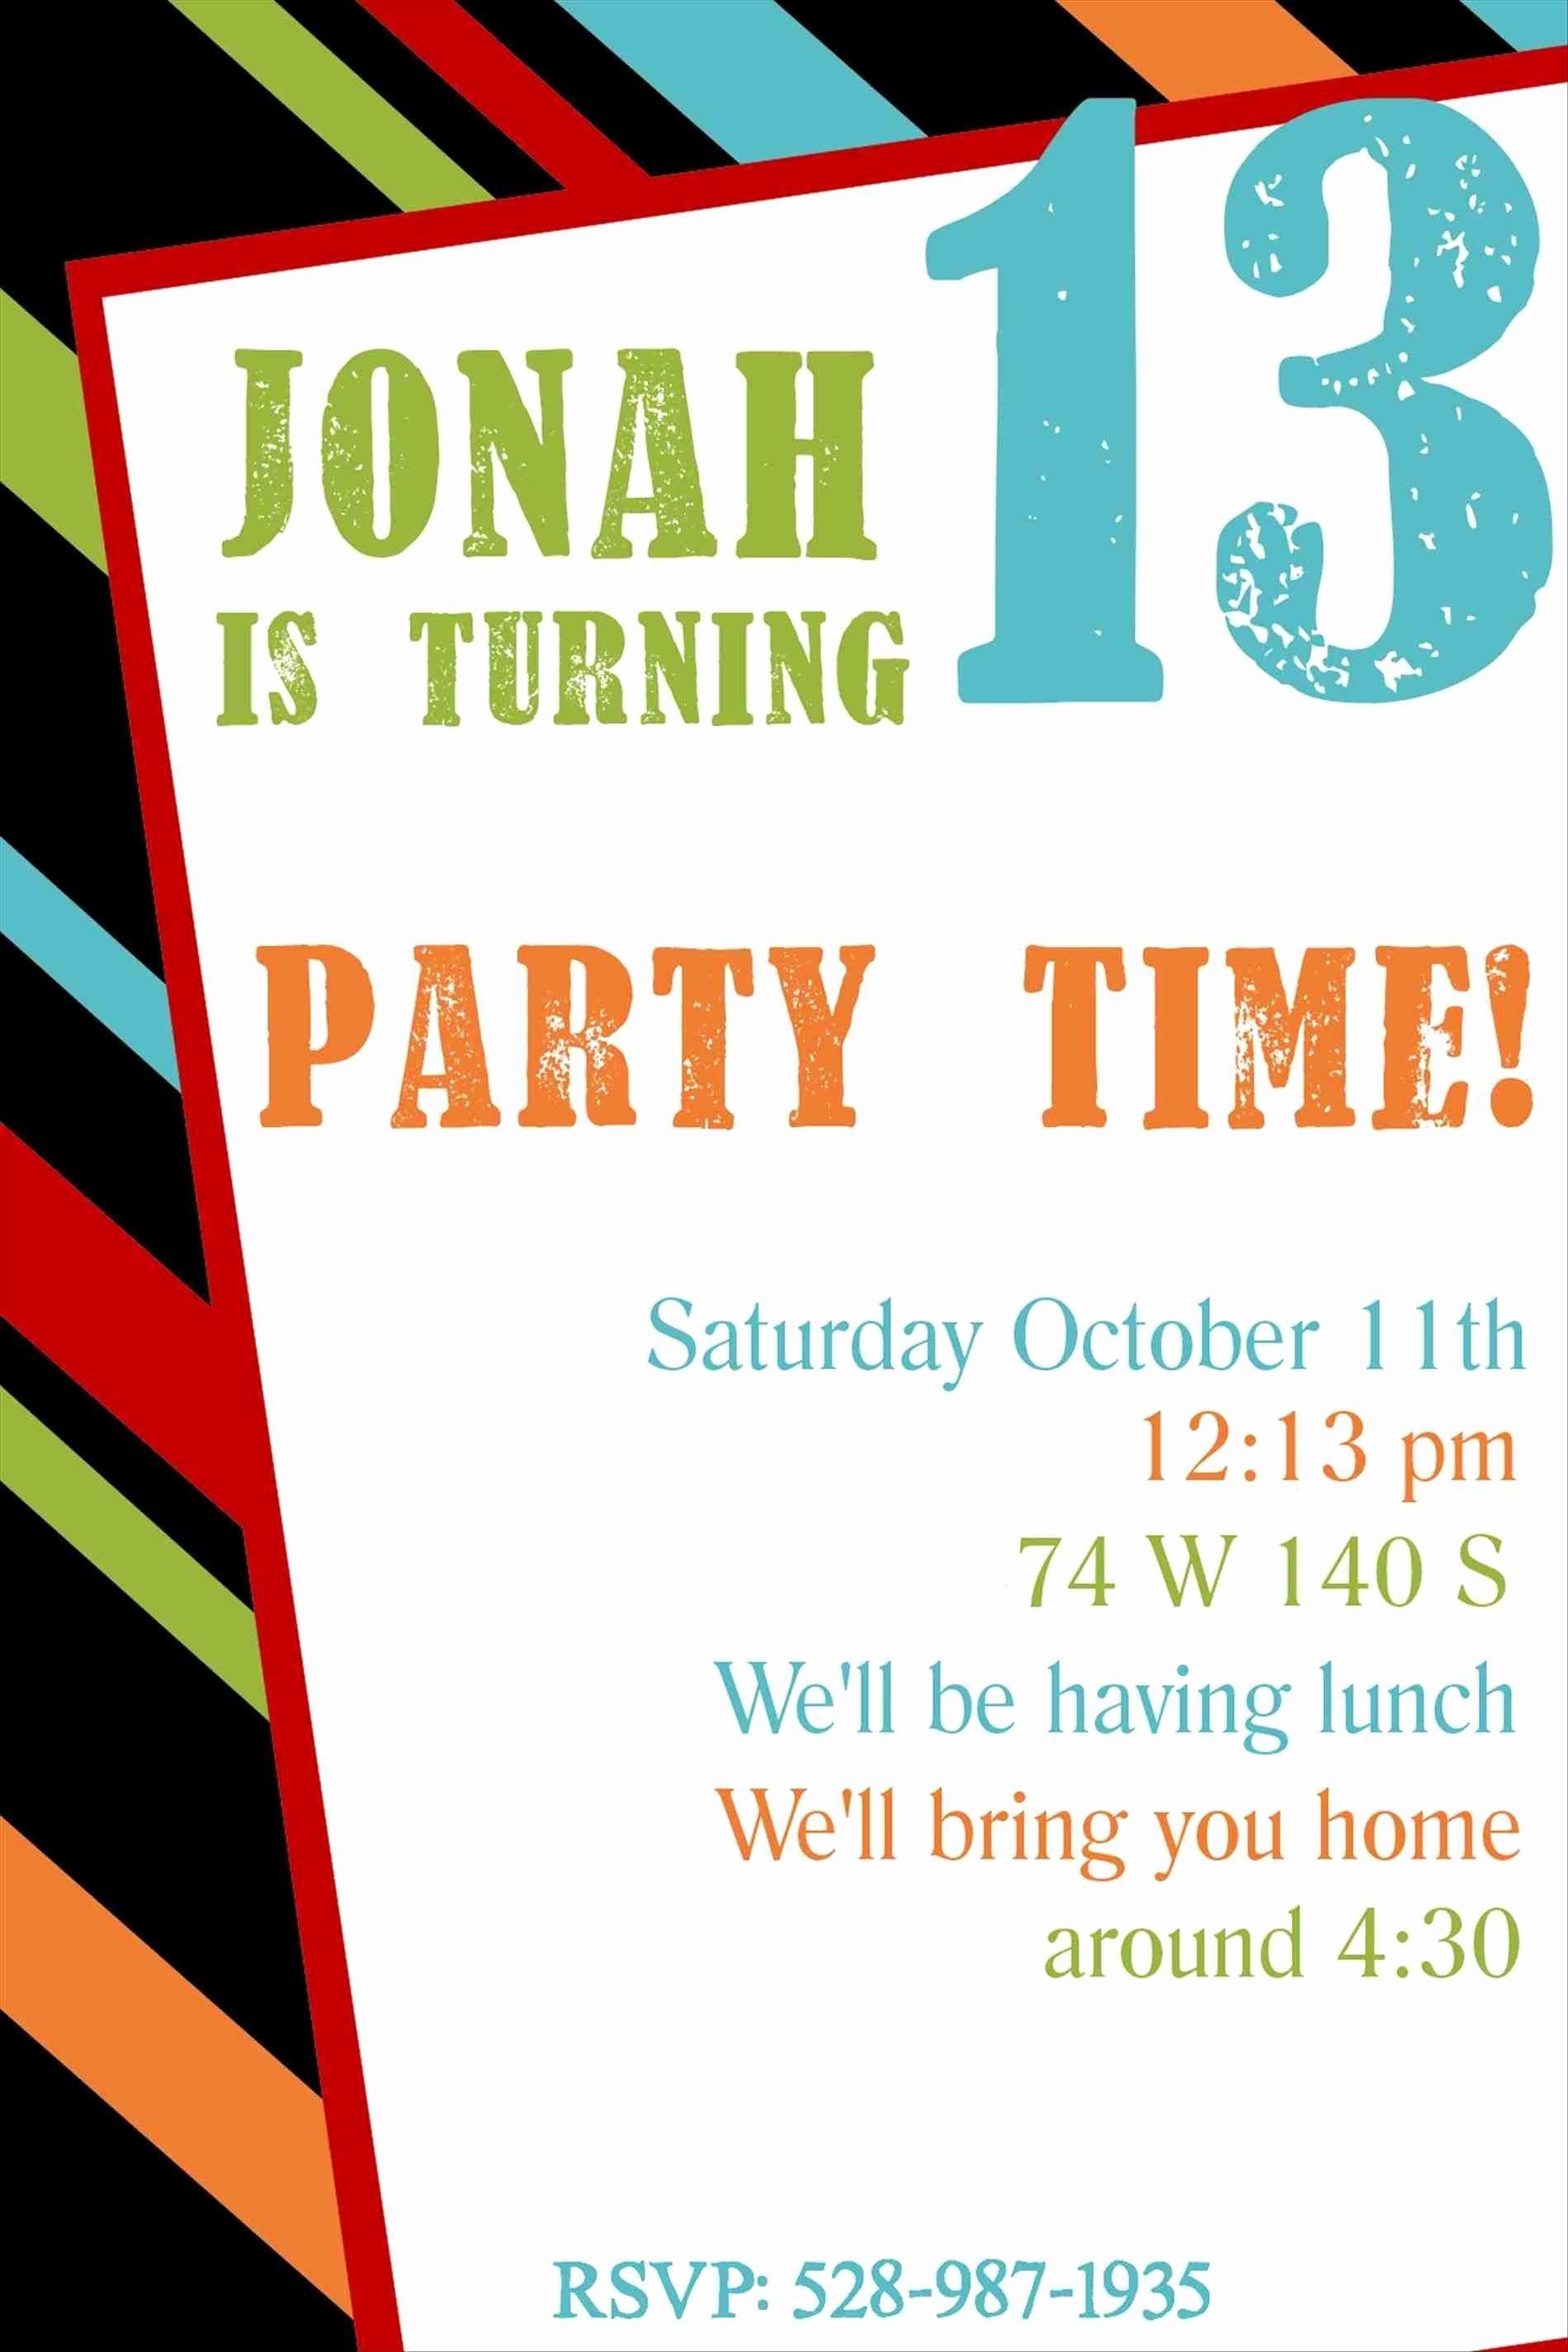 Kids Birthday Invitation Template Inspirational Full Siz Birthday Party Invitations Printable Birthday Party Invitation Templates Birthday Invitation Templates